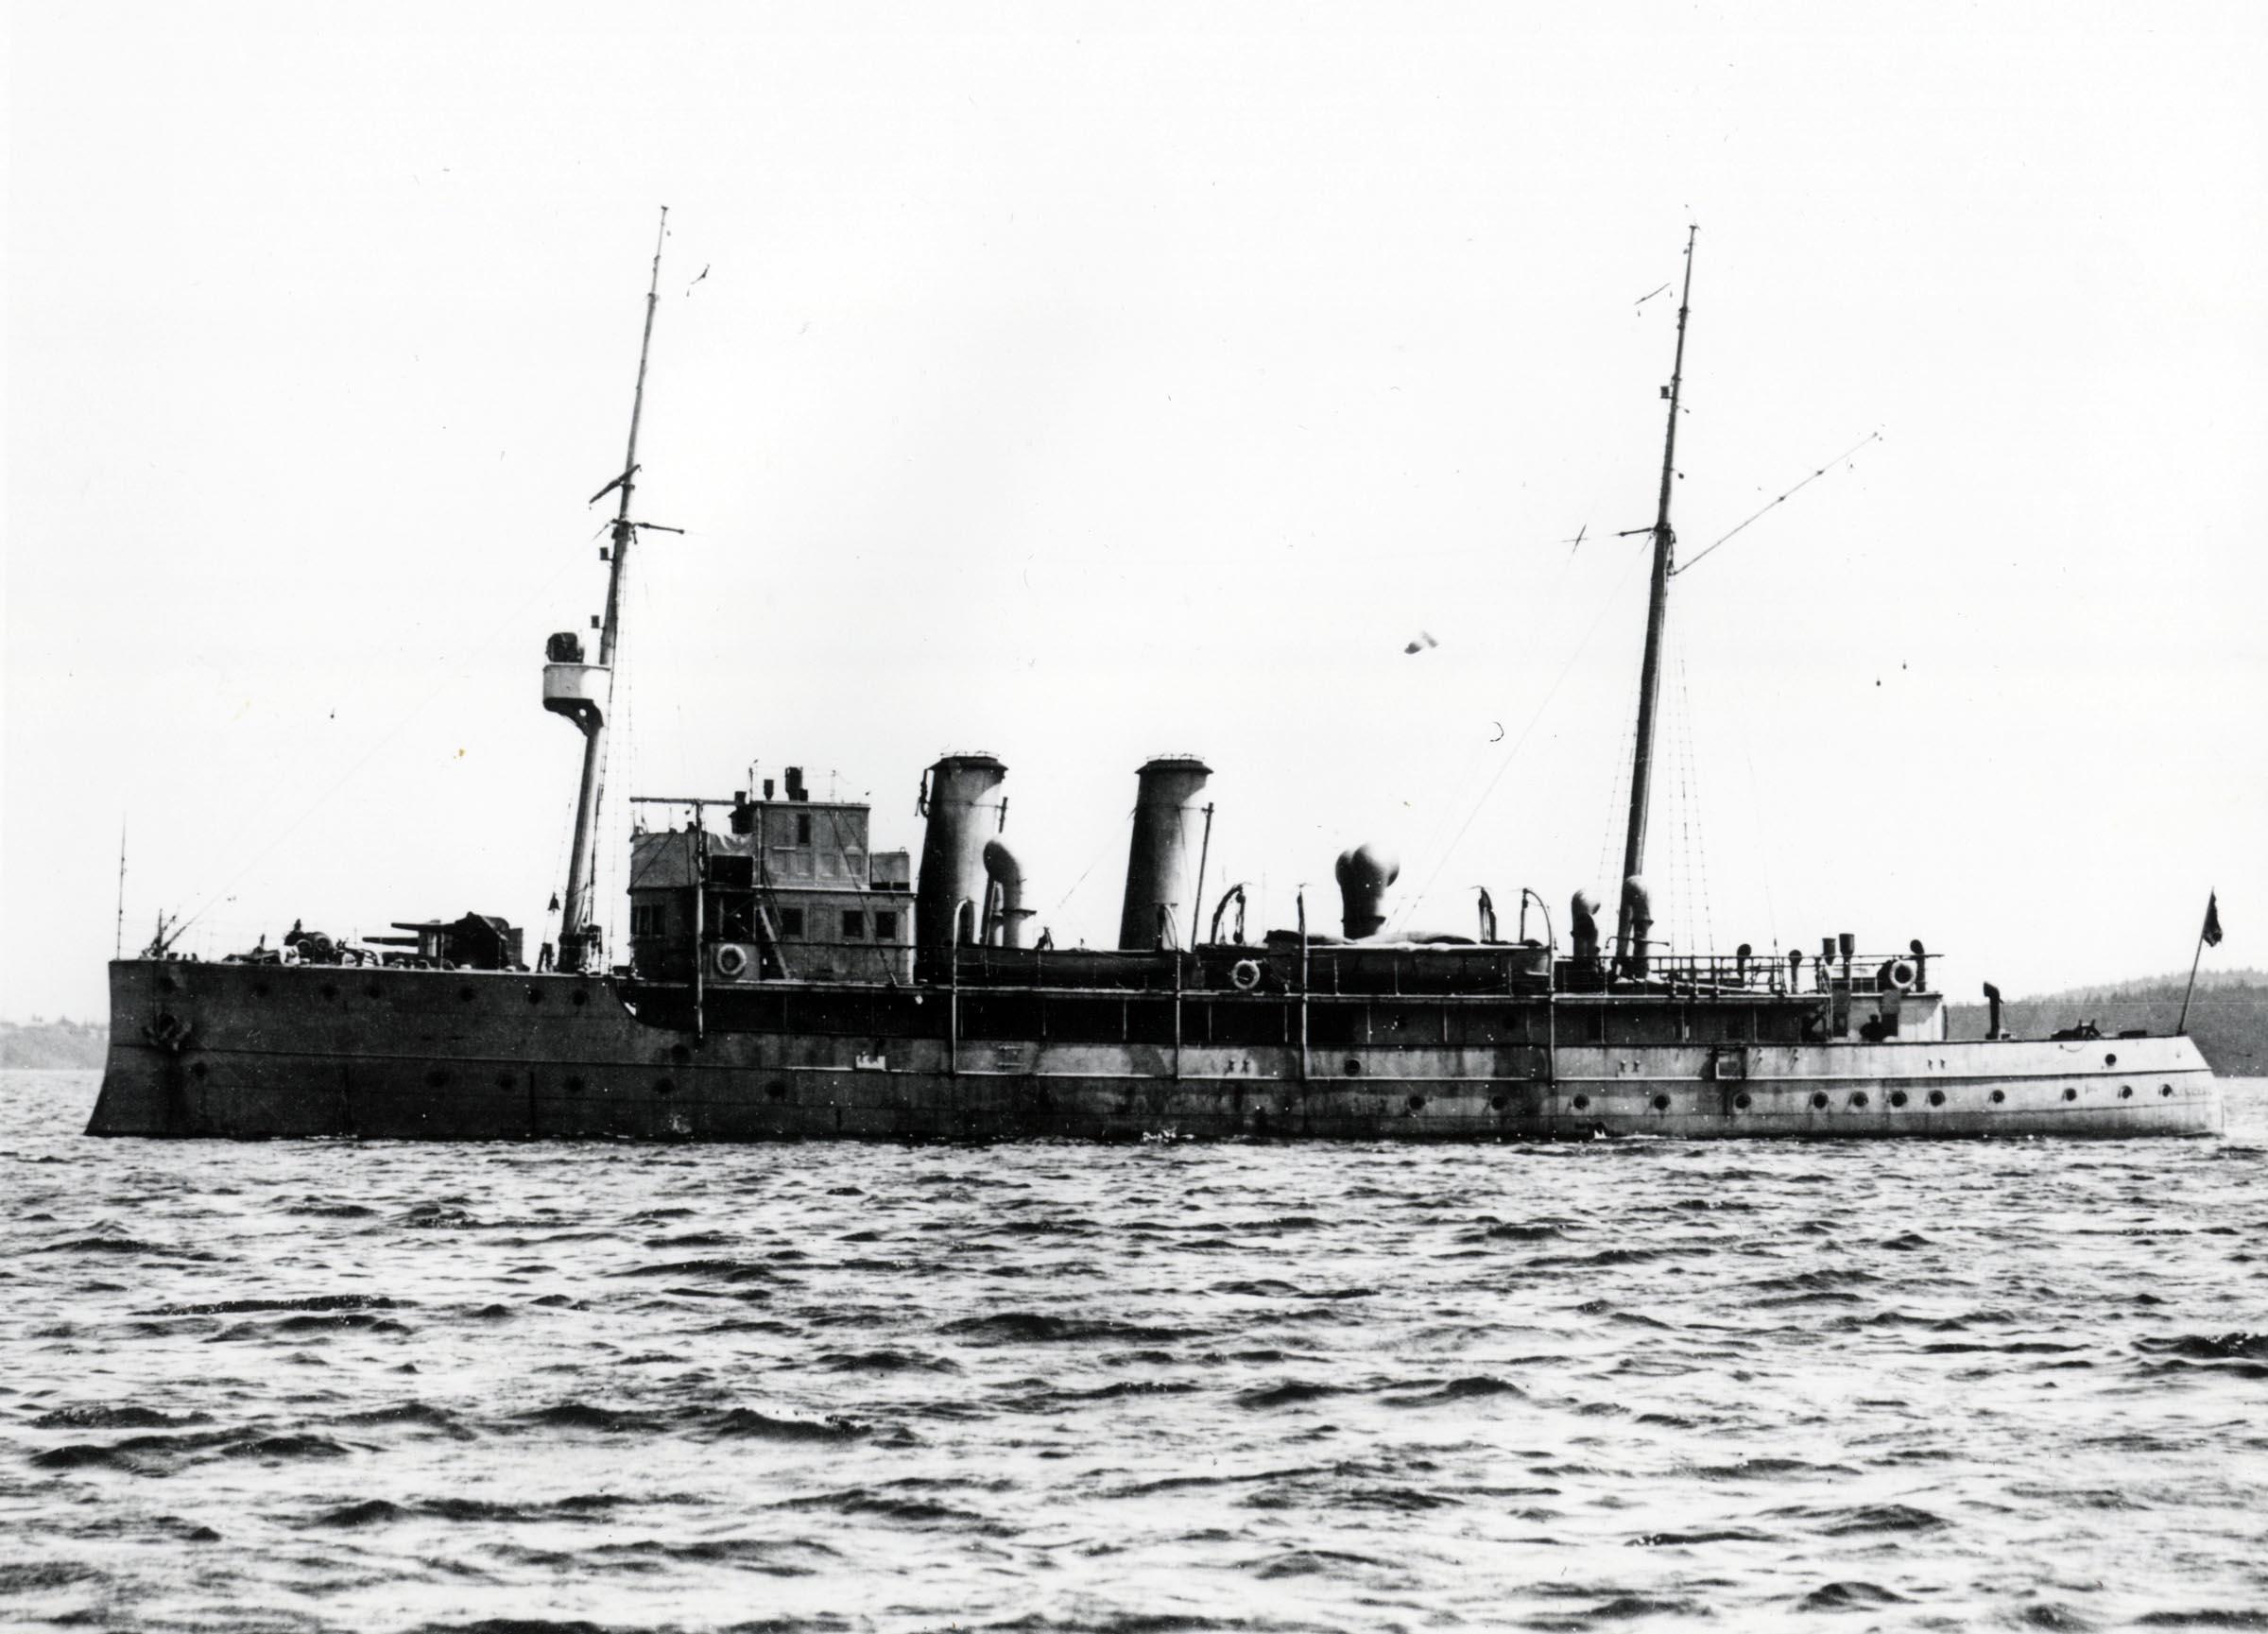 HMCS MARGARET